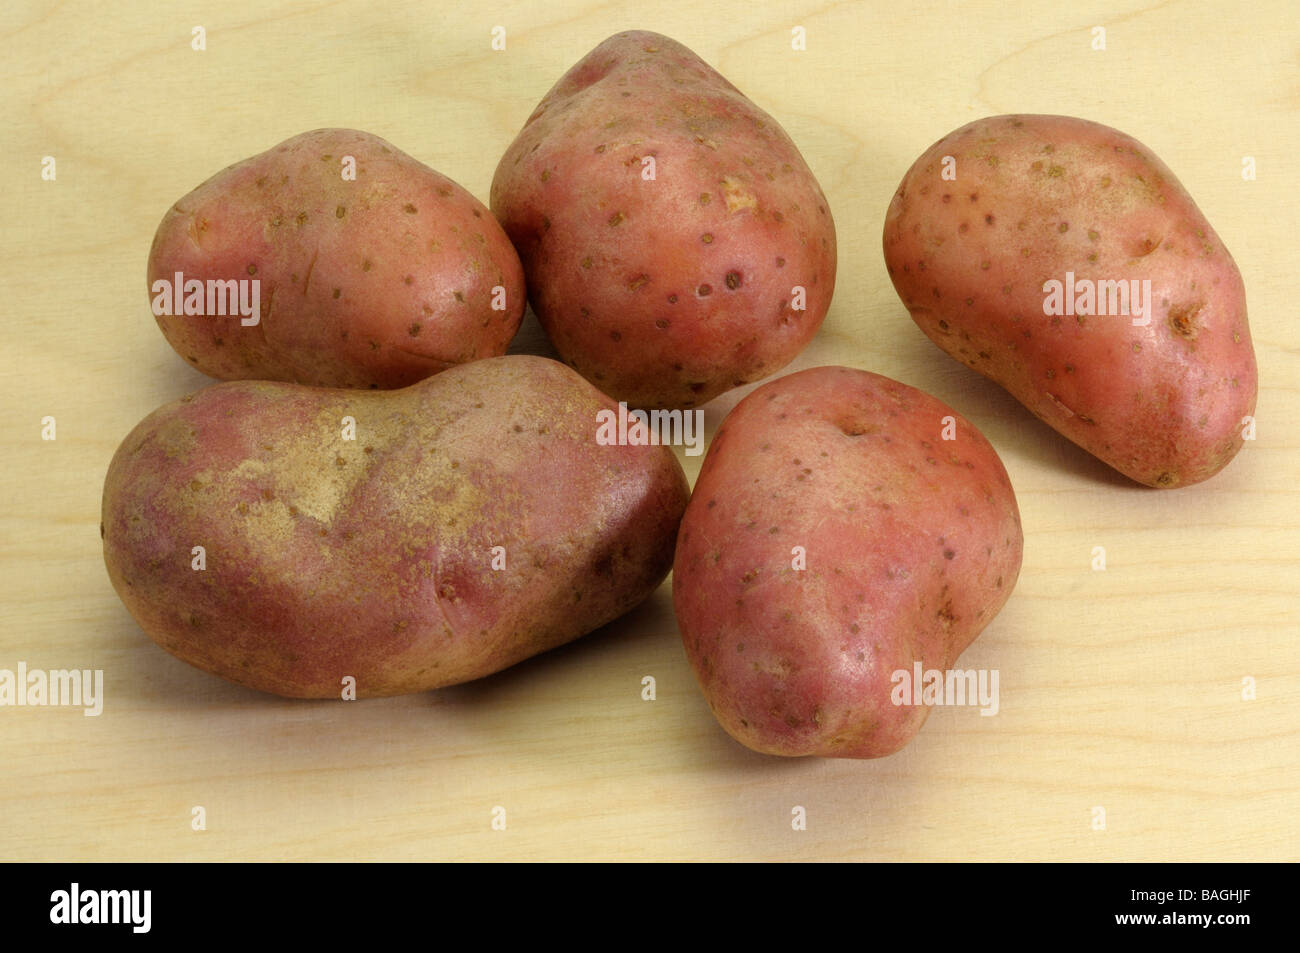 Potato (Solanum tuberosum), variety: Cherie, studio picture - Stock Image